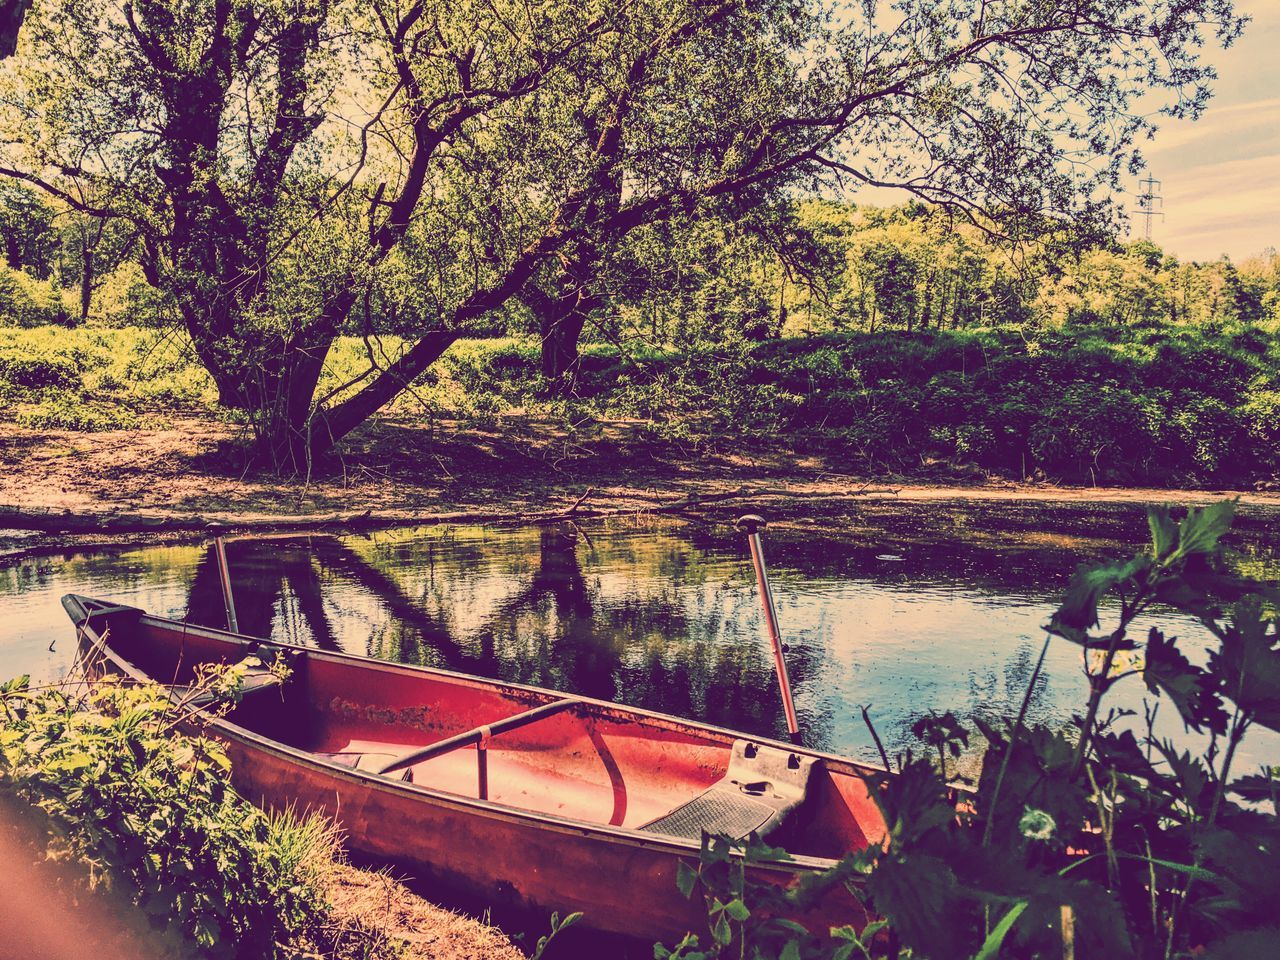 Boat Moored On Lake Against Trees